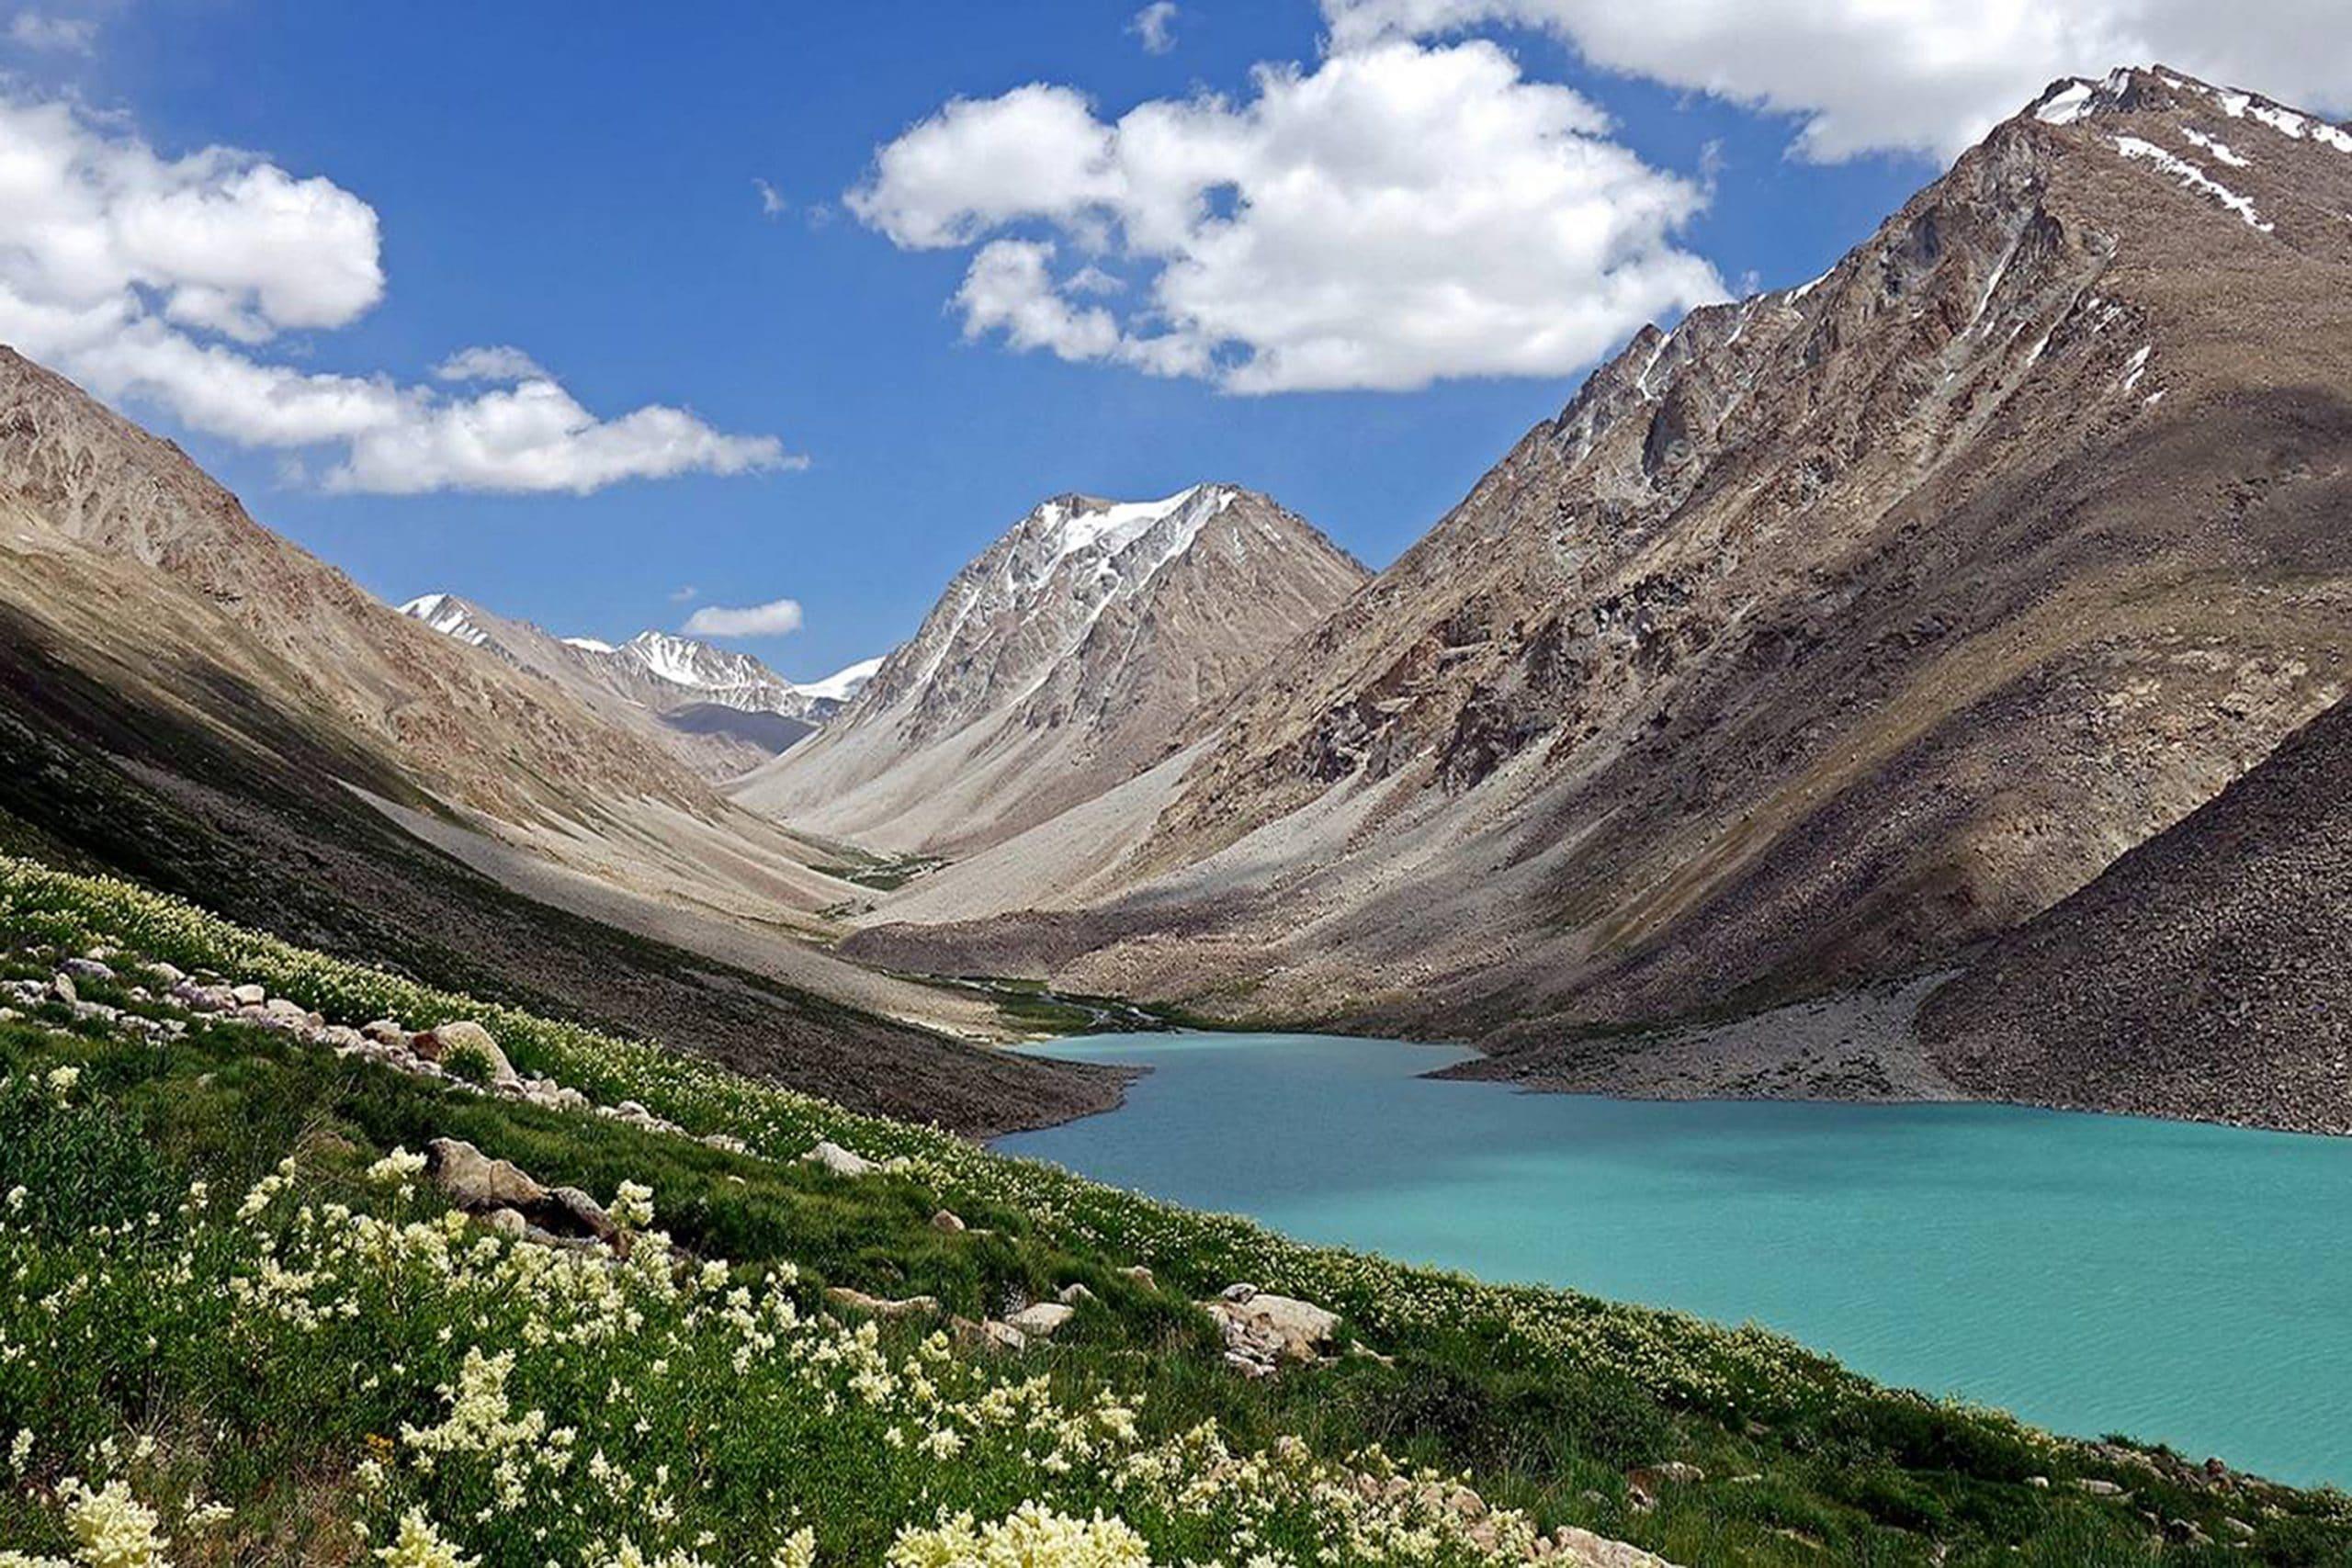 Pamir Central Asia